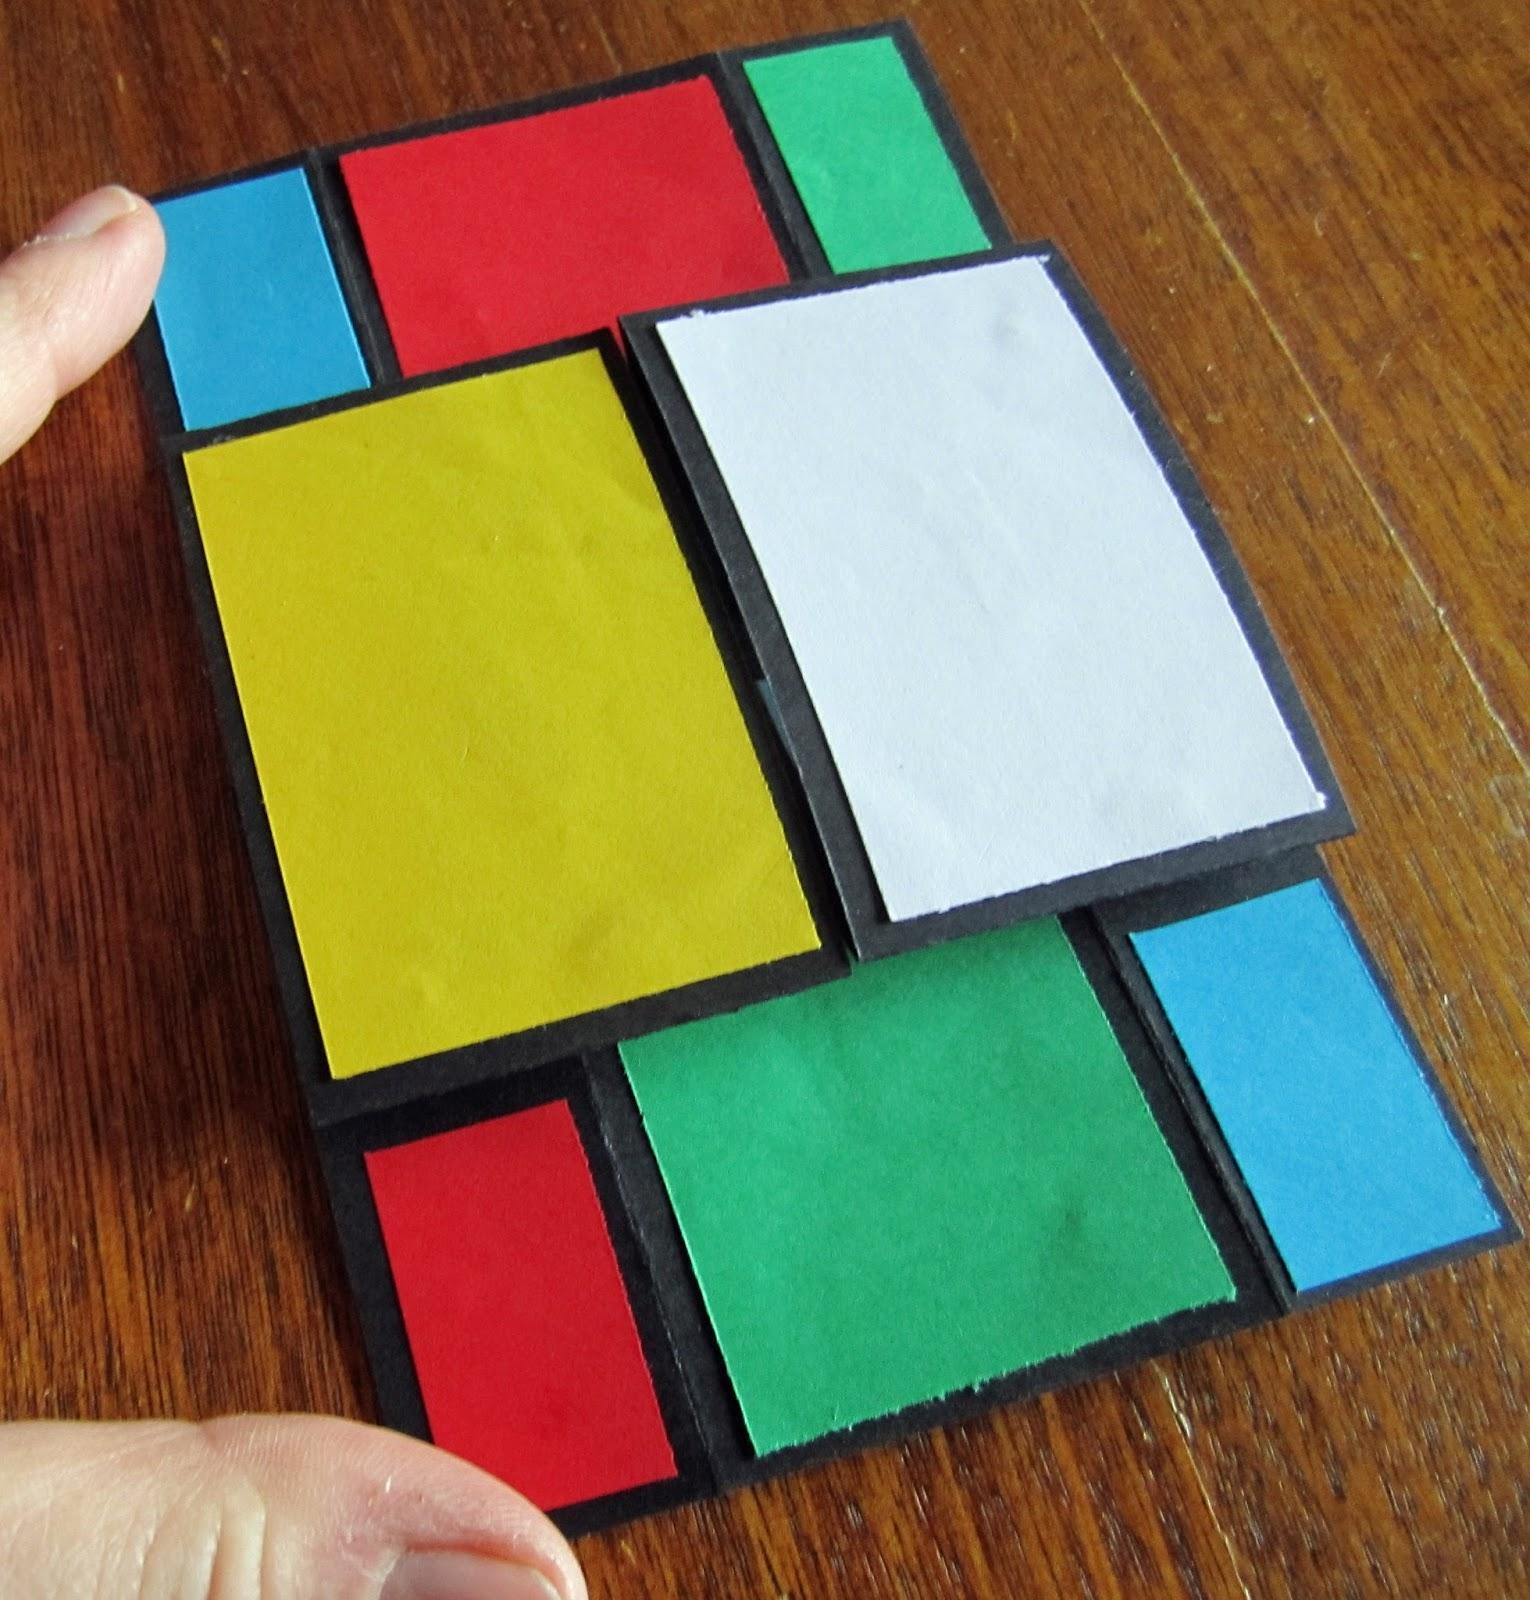 trek of cube